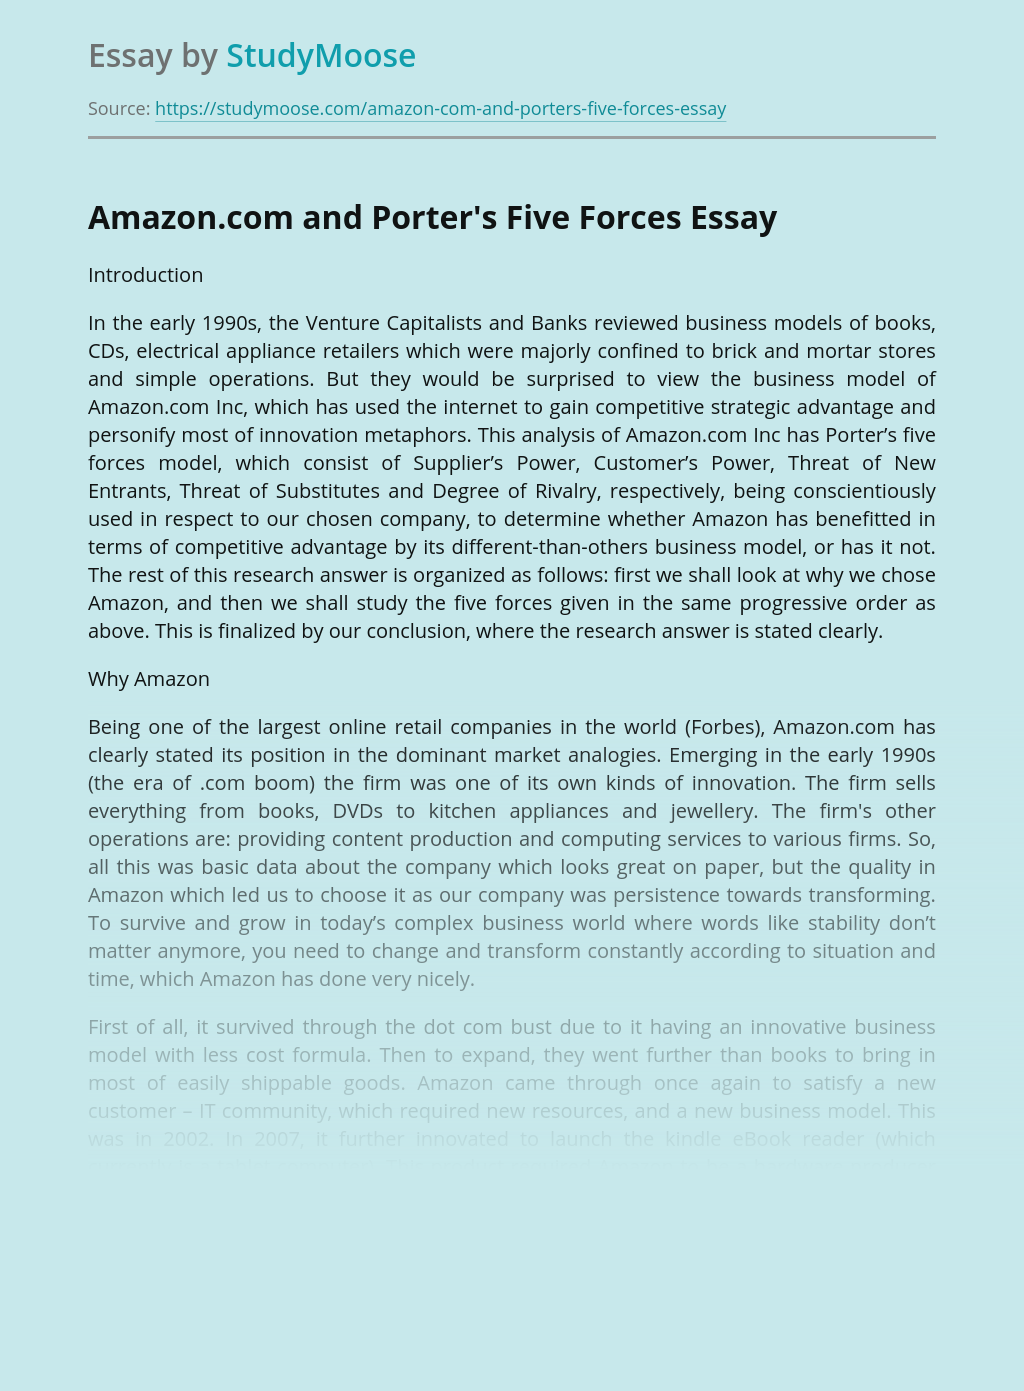 Business Marketing of Amazon.com